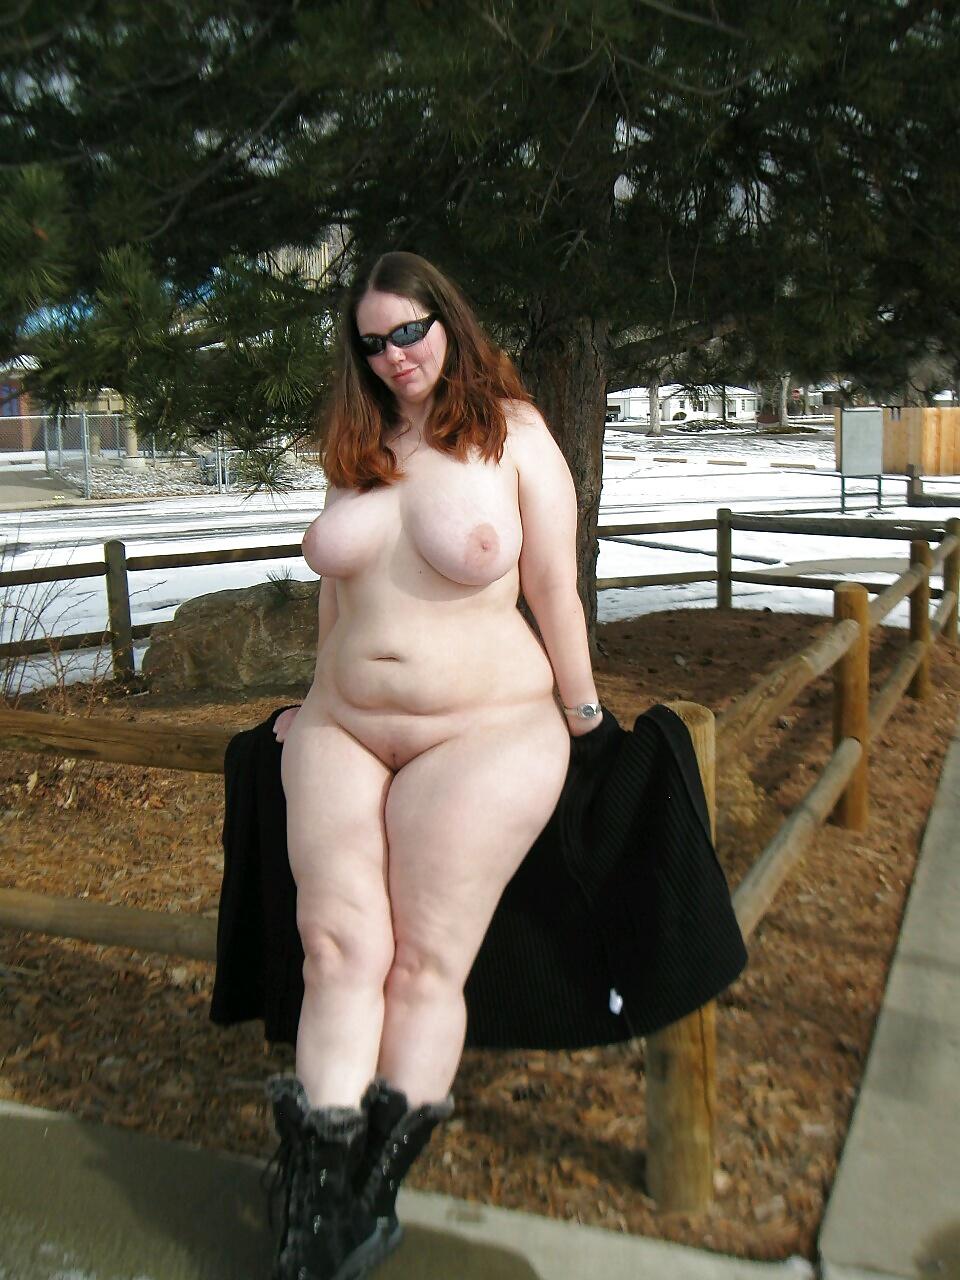 Retro cartoon chubby woman plus size curves bbw girl vintage